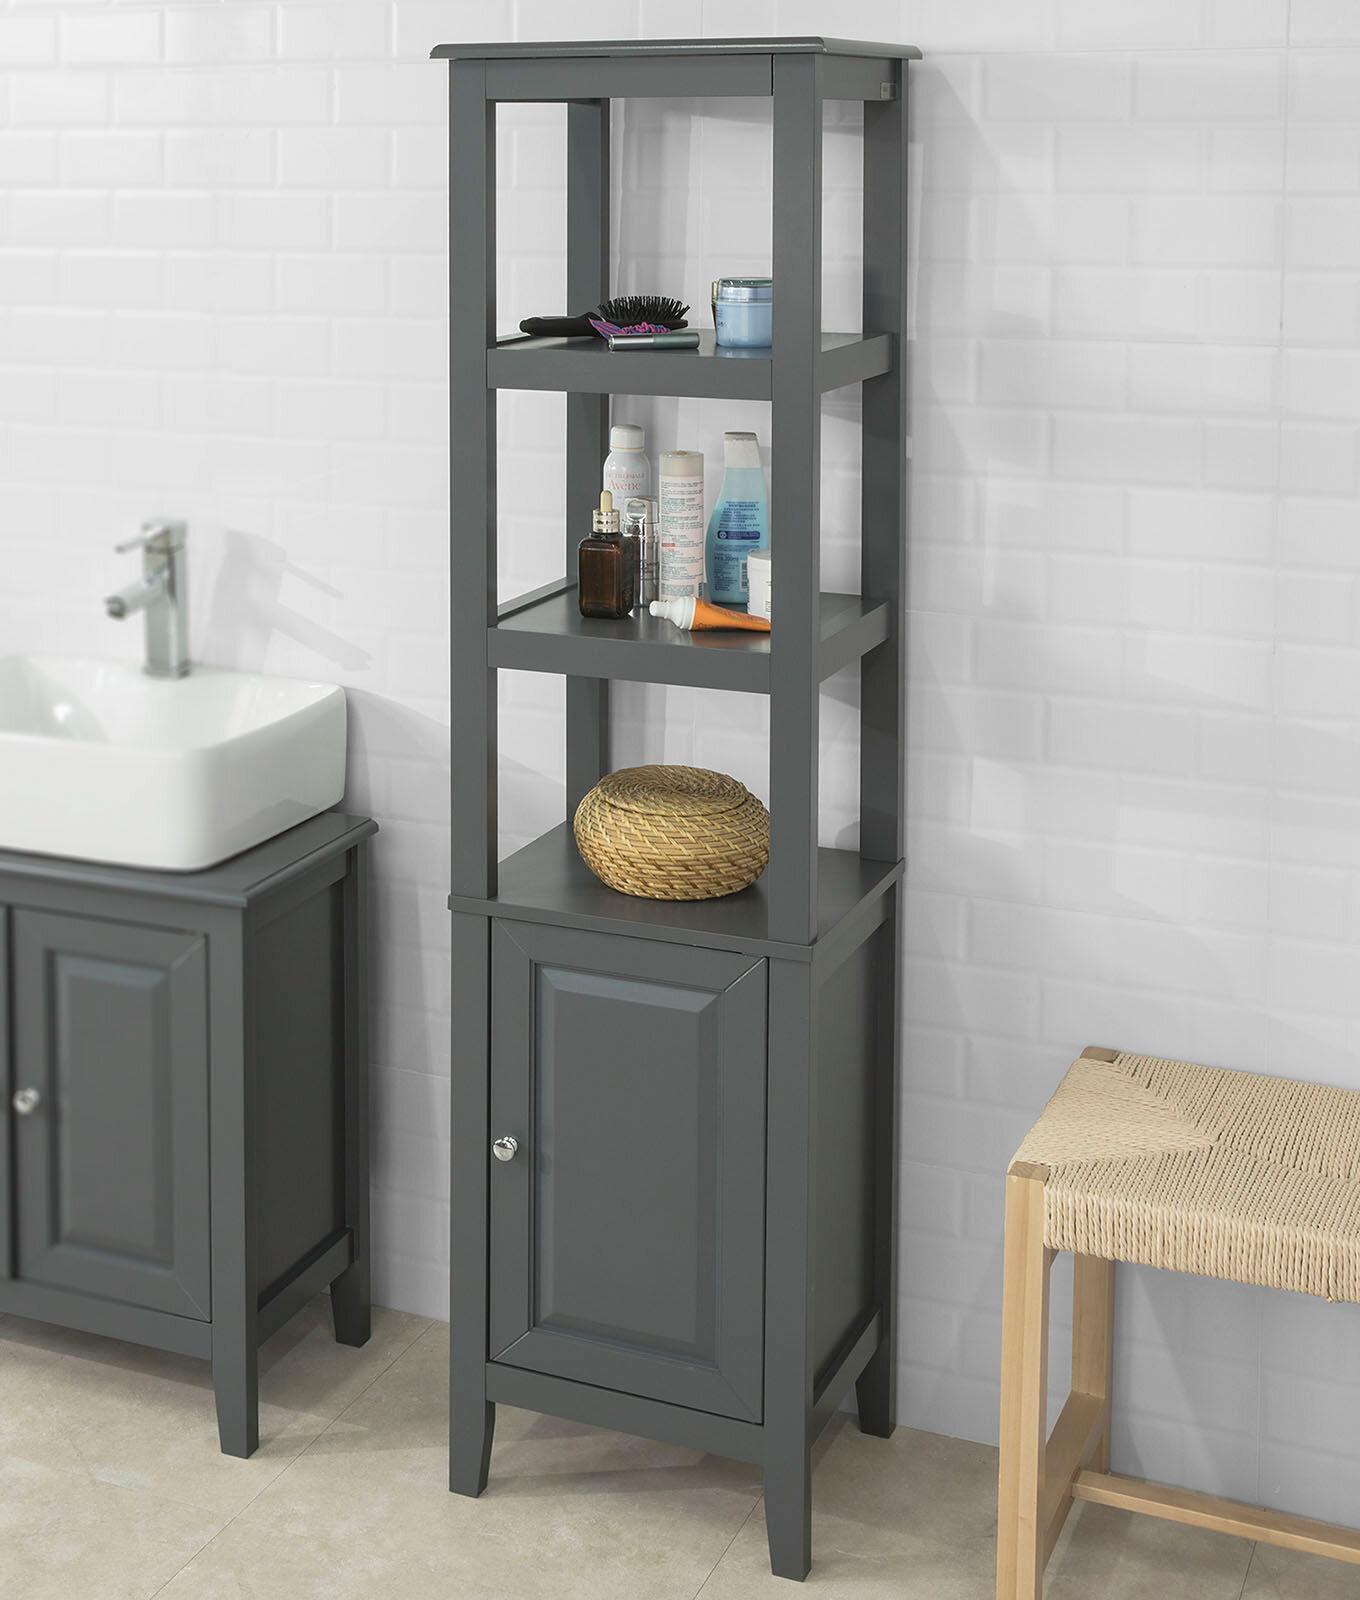 Burkhardt 7 x 7cm Tall Bathroom Cabinet